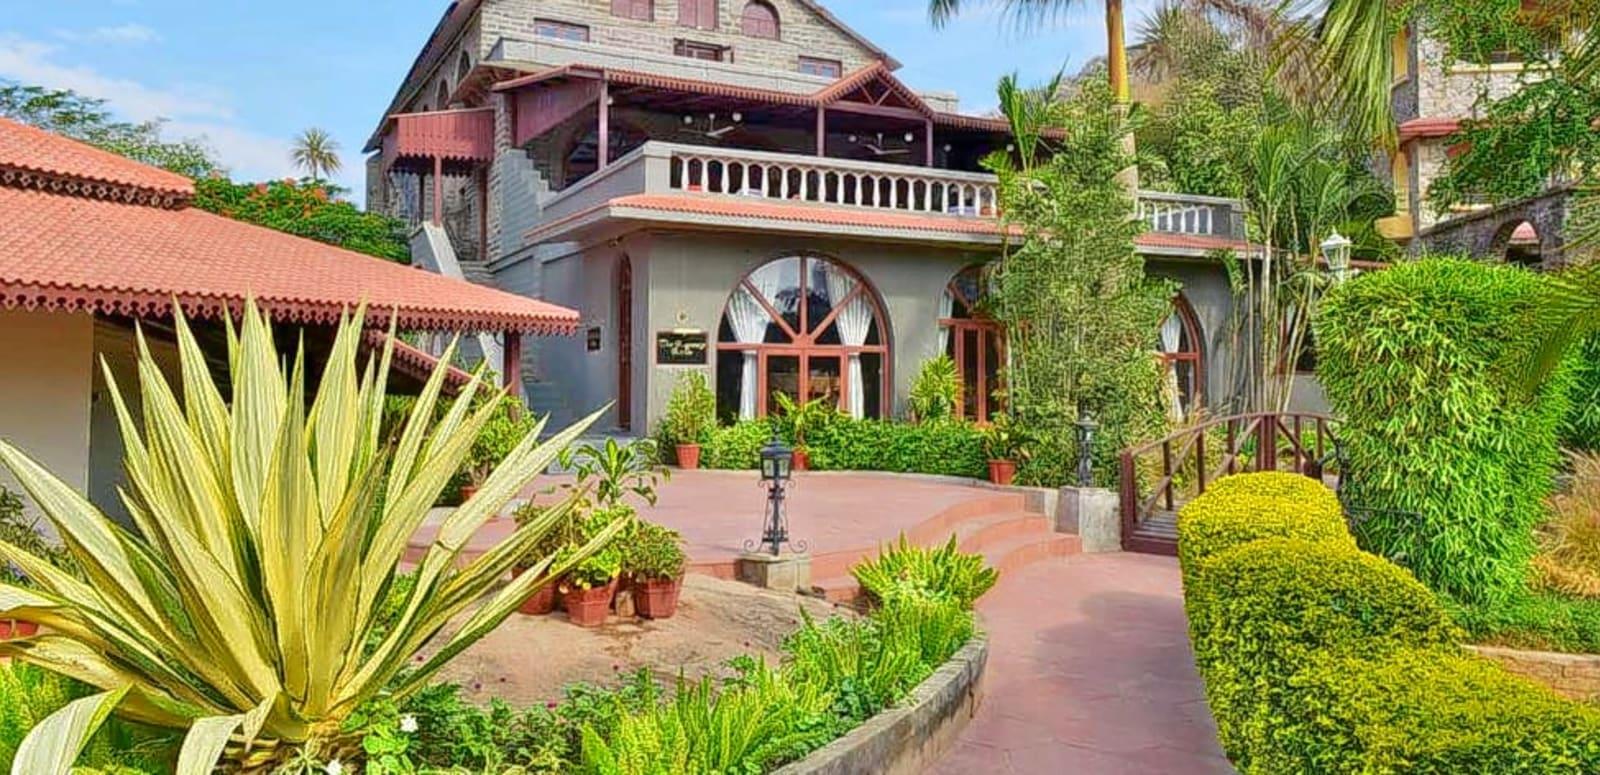 Cama-Rajputana-Club-Resort-Heritage-Hotel-In-Rajasthan